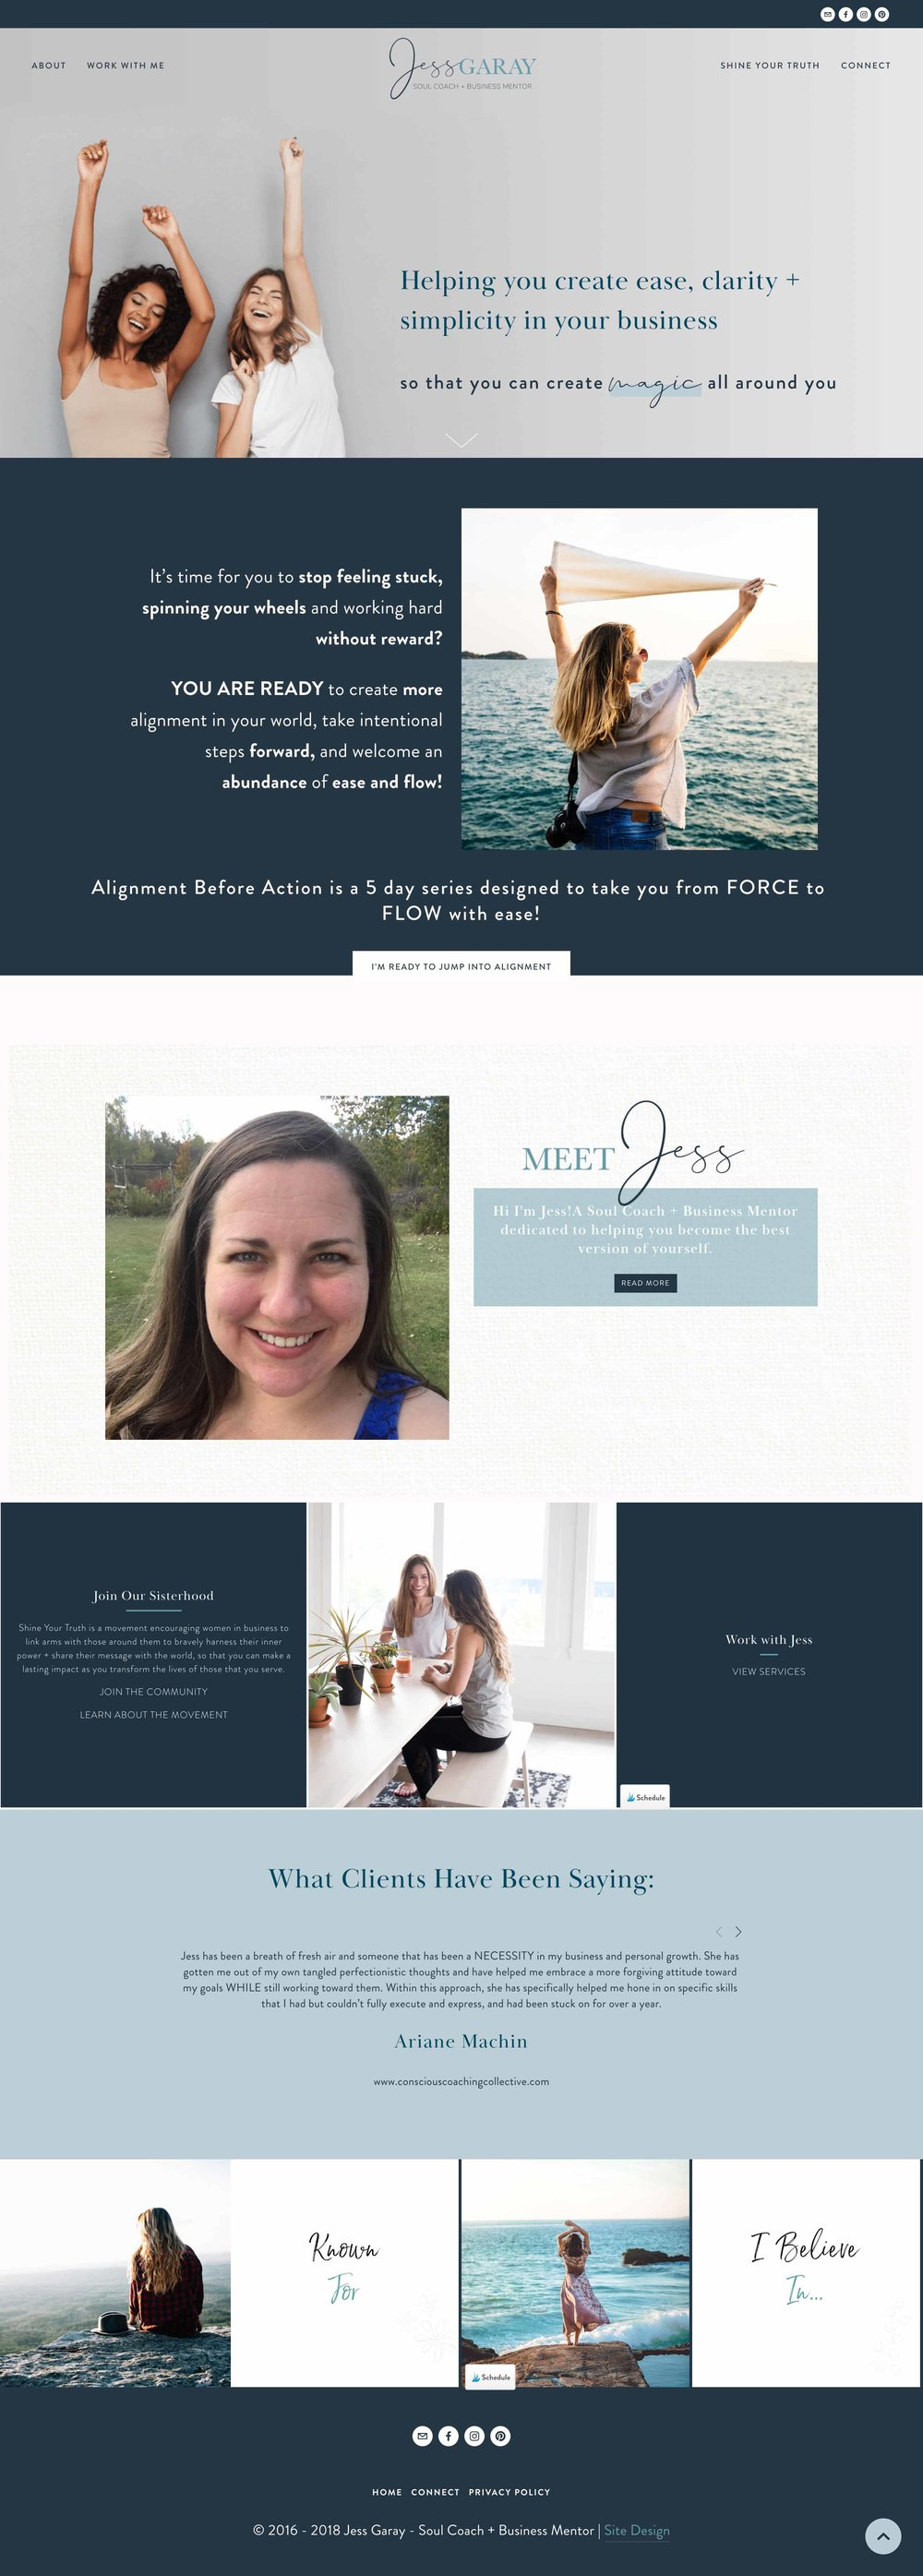 Erin Alexander - screencapture-jessgaray-home-2018-11-15-13_06_05.jpg